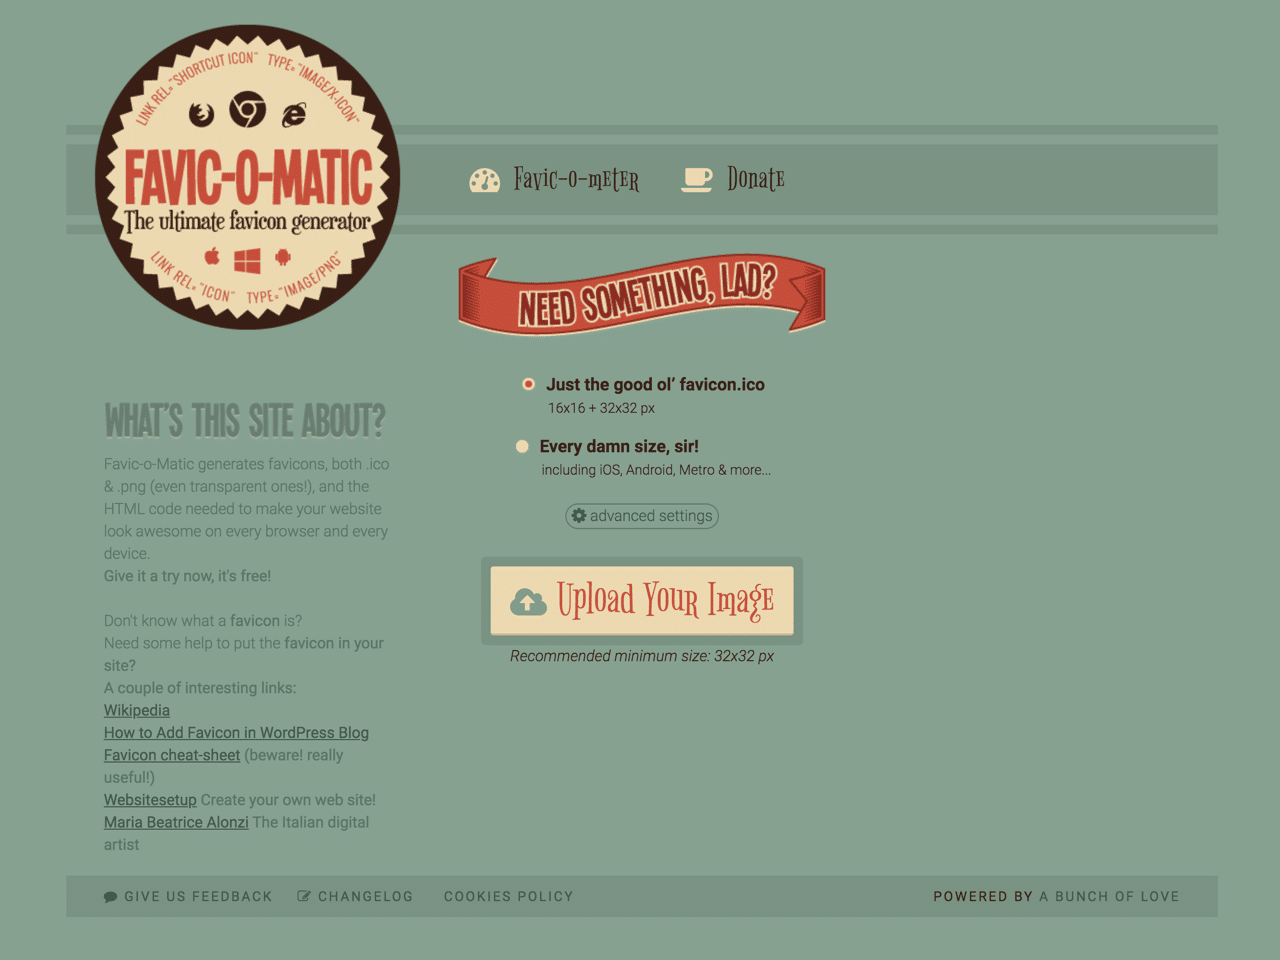 Favic-o-Matic 快速裁切、製作各種尺寸大小的 Favicon 網站圖示